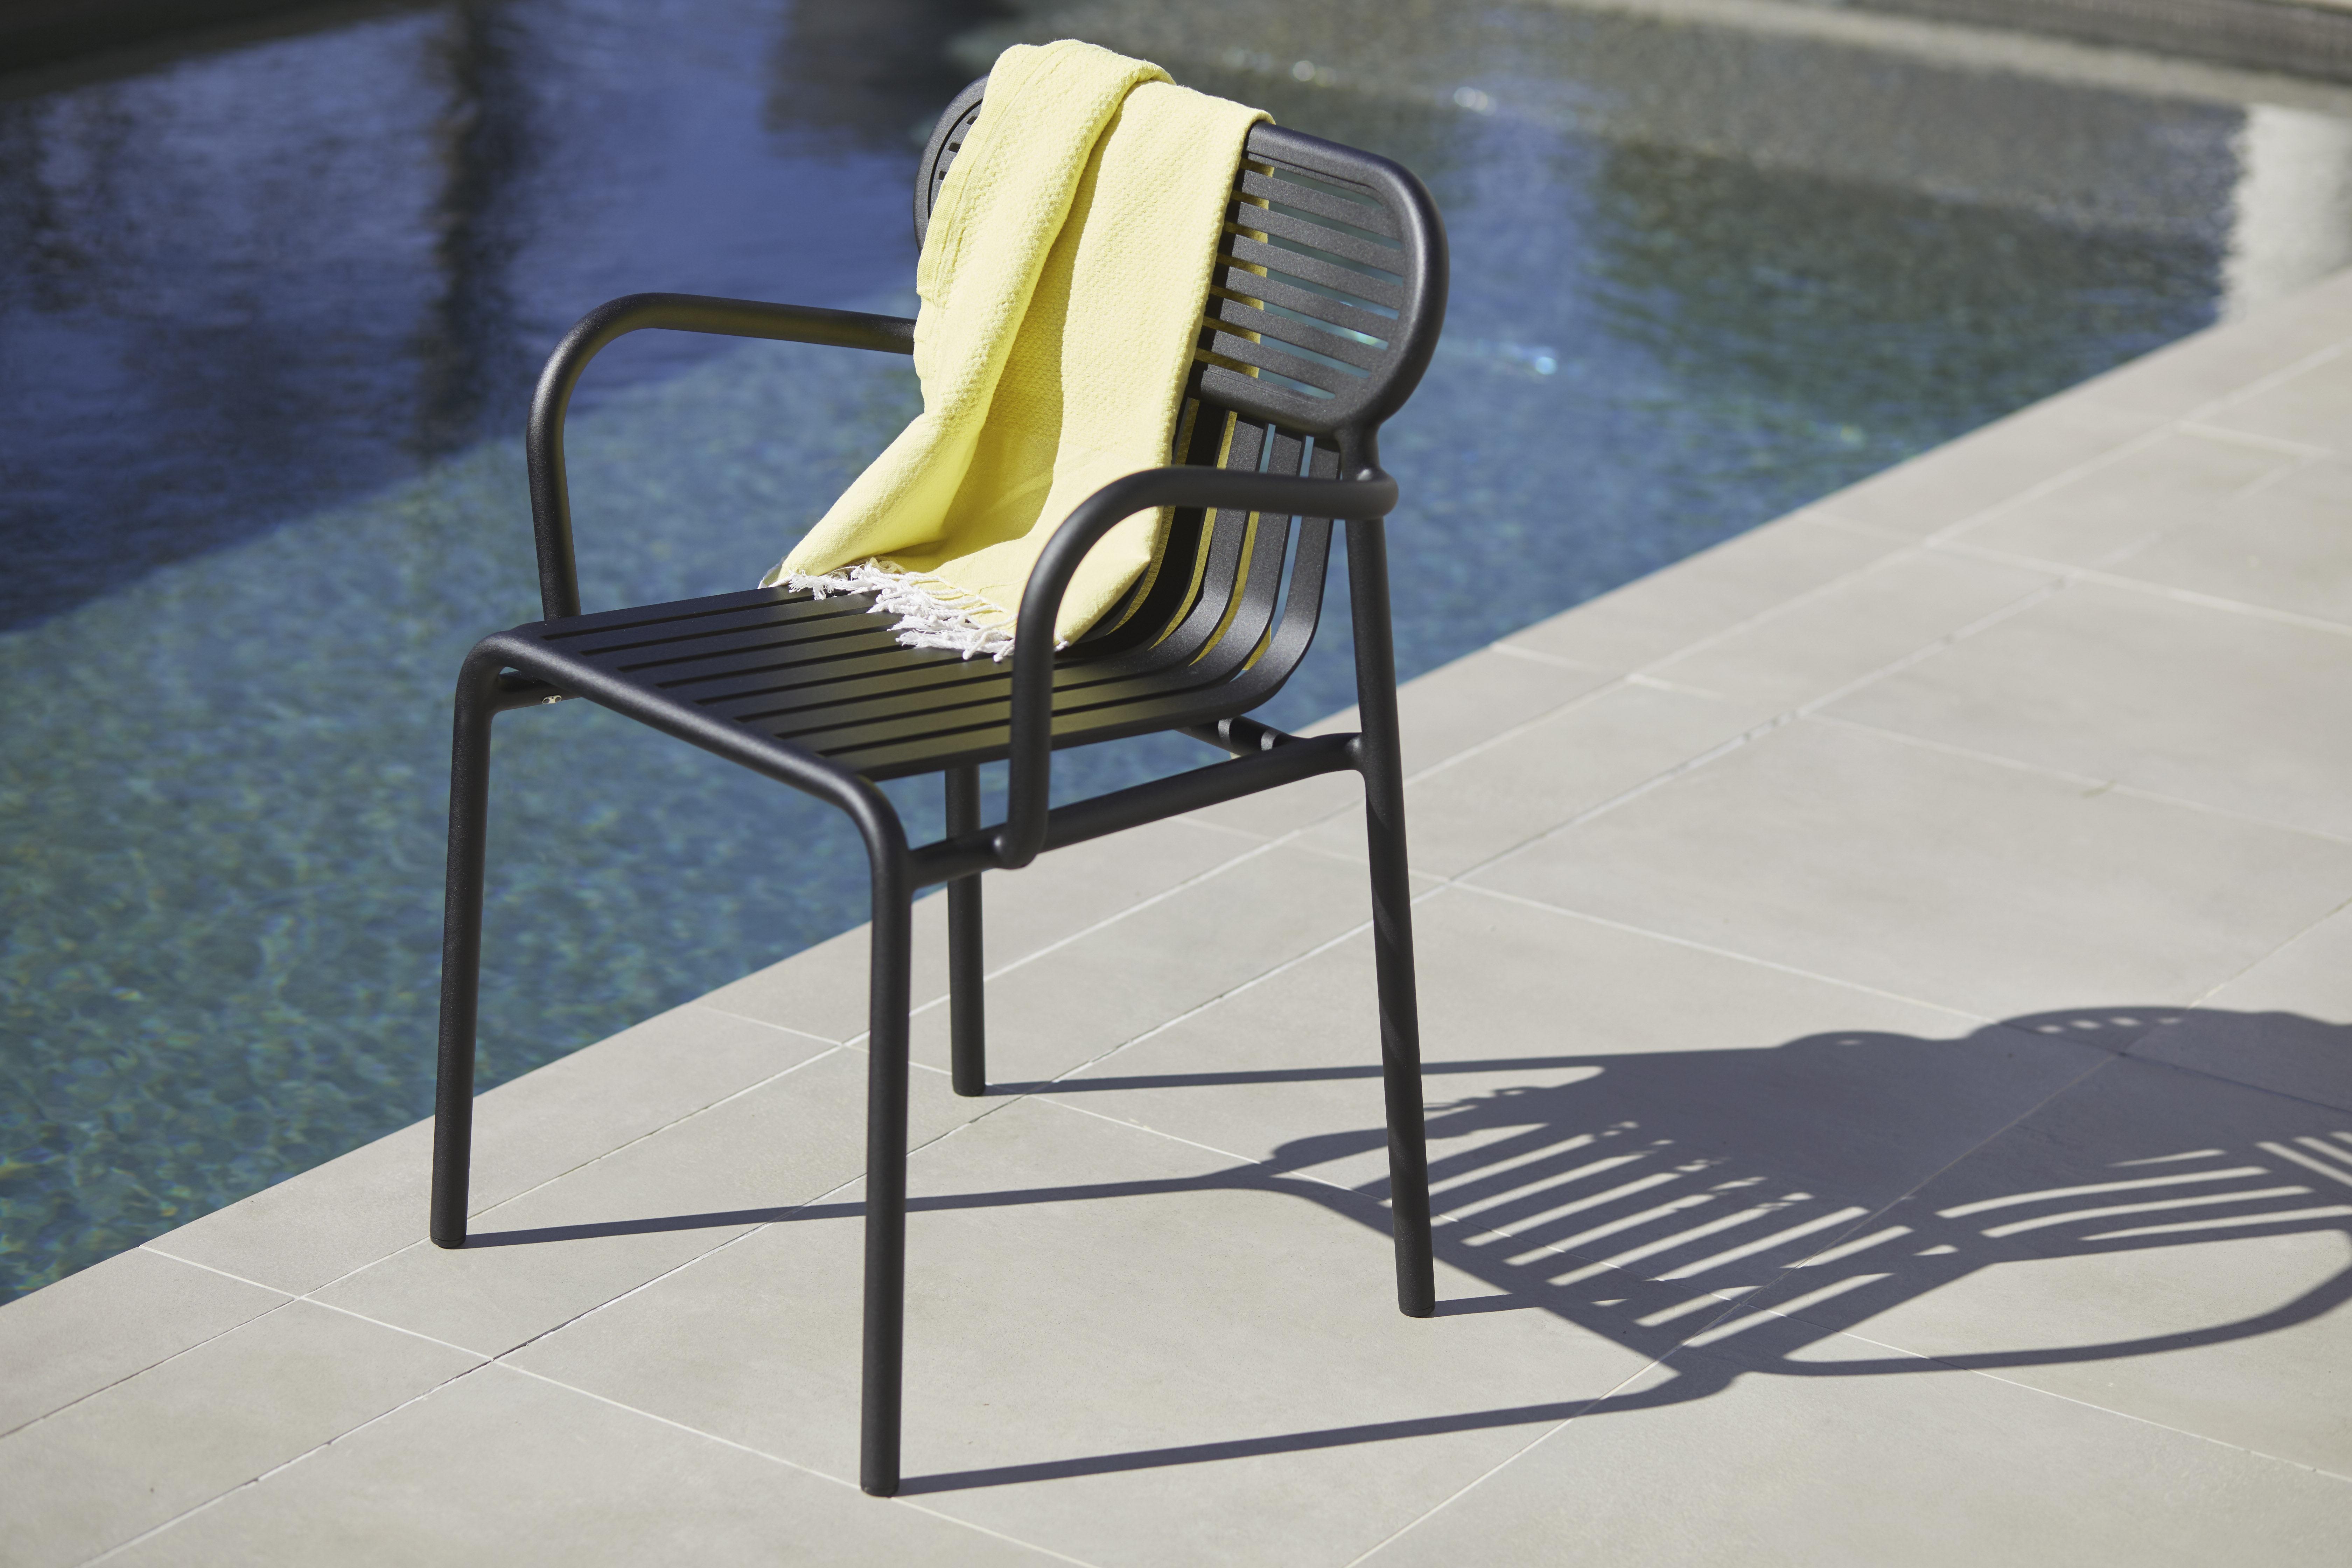 fauteuil bridge week end aluminium blanc petite friture made in design. Black Bedroom Furniture Sets. Home Design Ideas